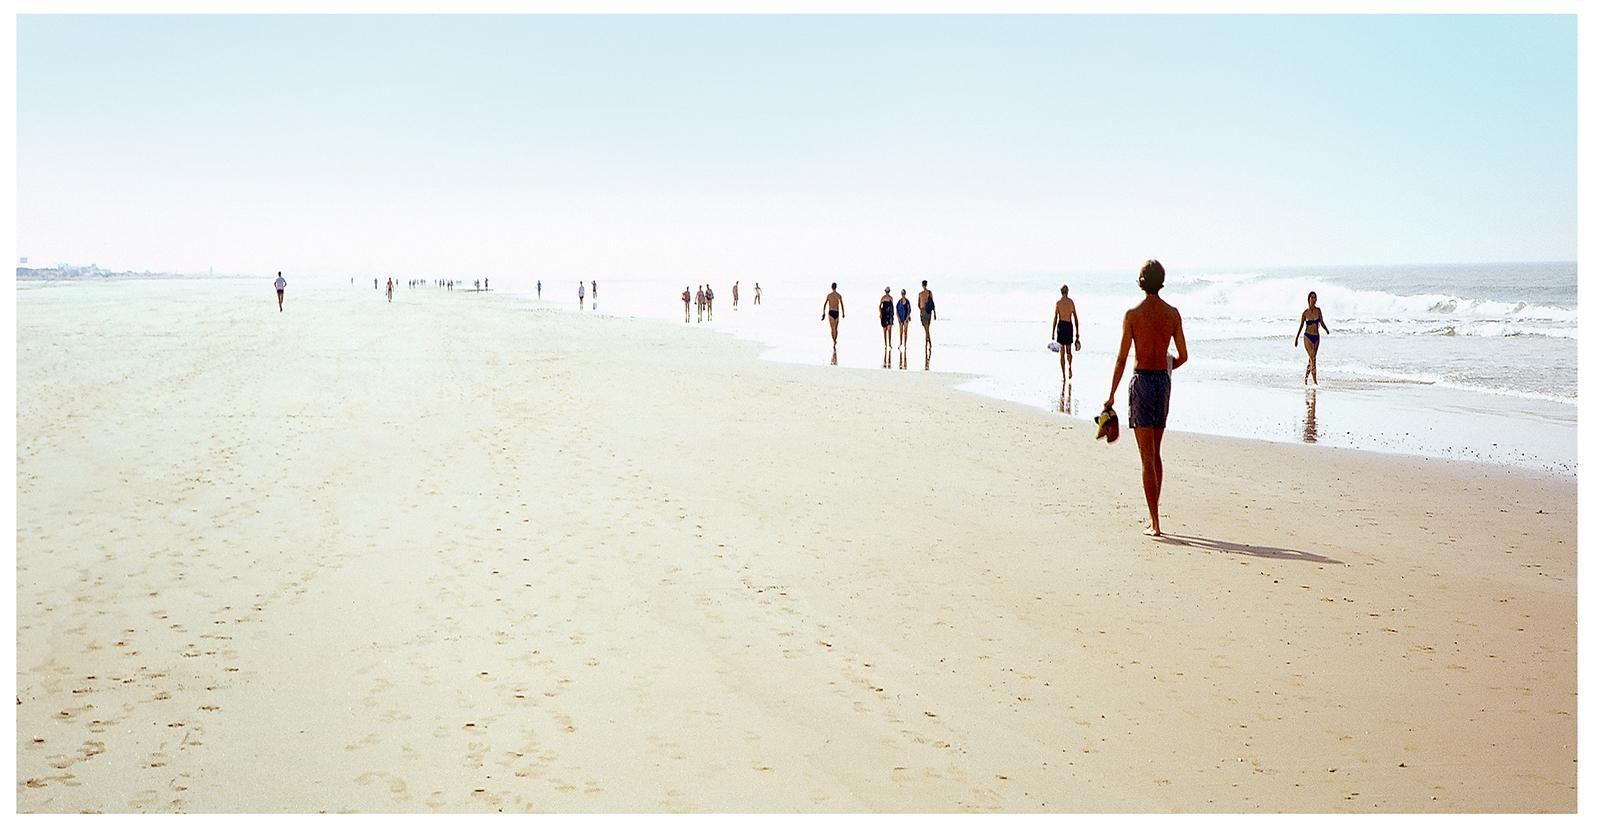 Cadiz- Signed limited edition fine art print, Color photography,Landscape,Beach